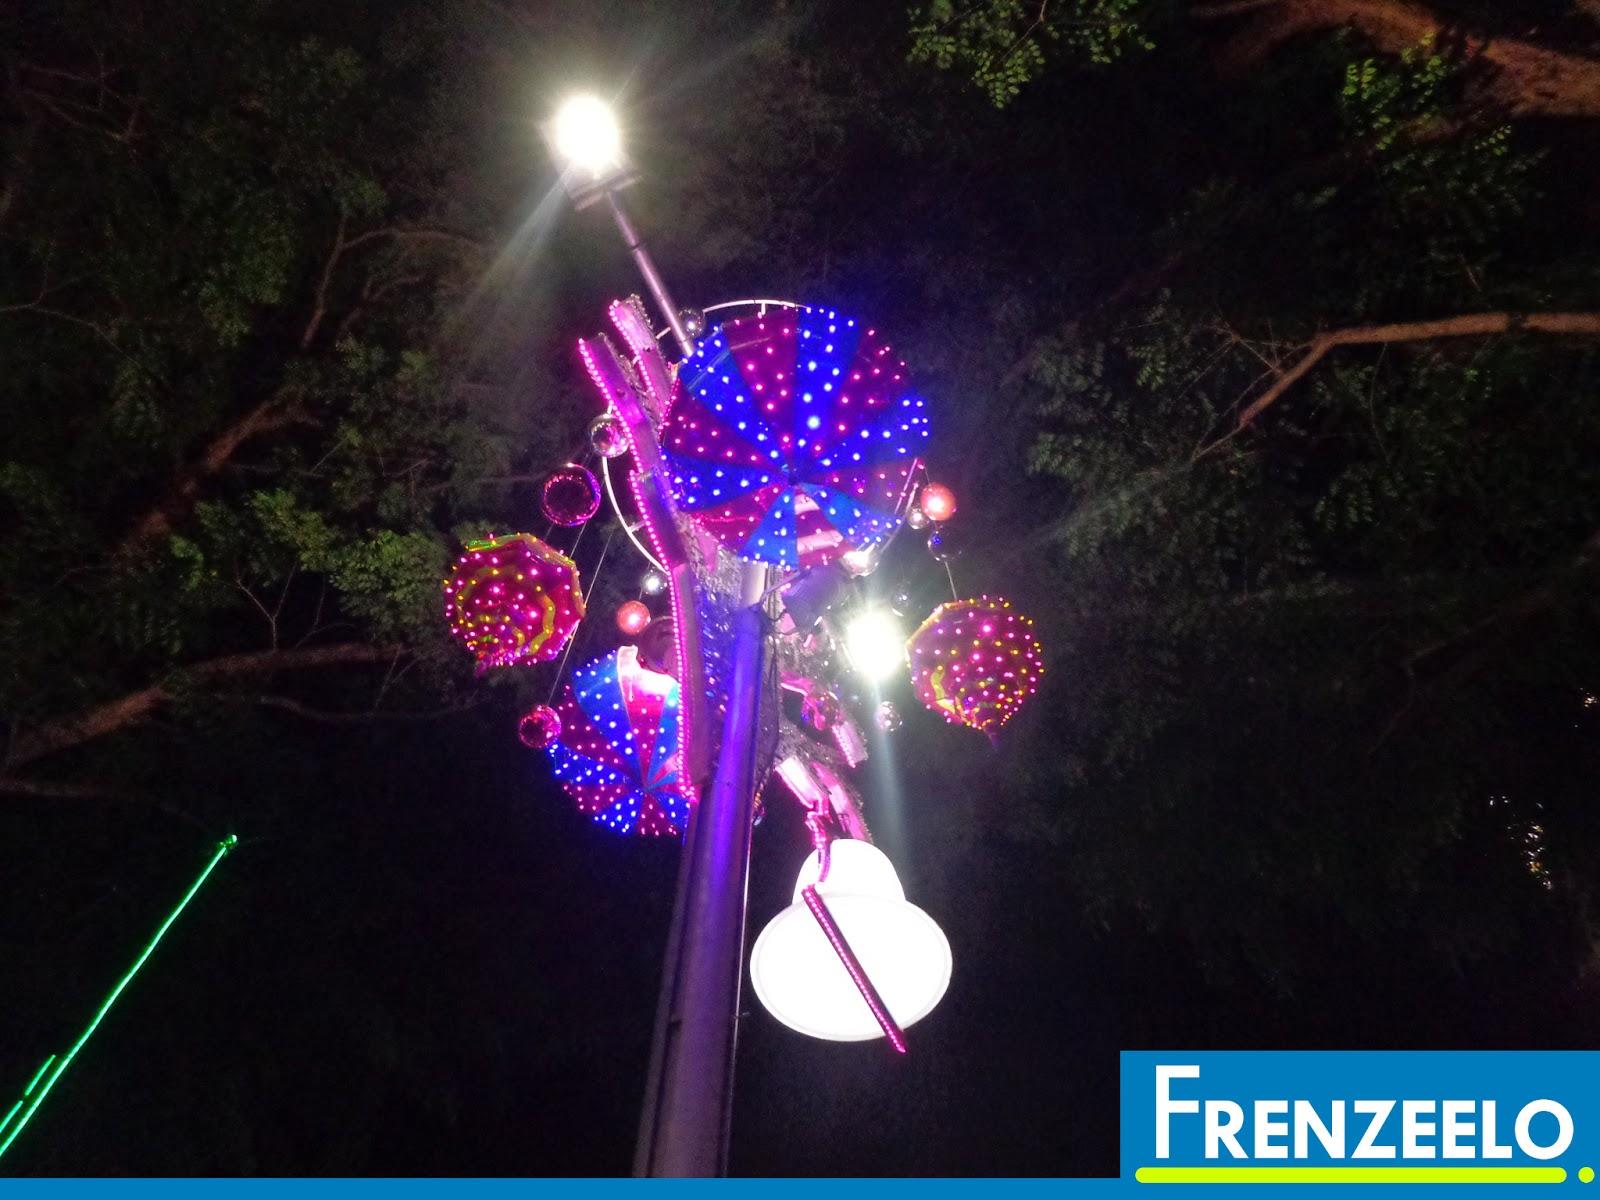 Frenzeelo: Orchard Road Christmas Light Up 2015